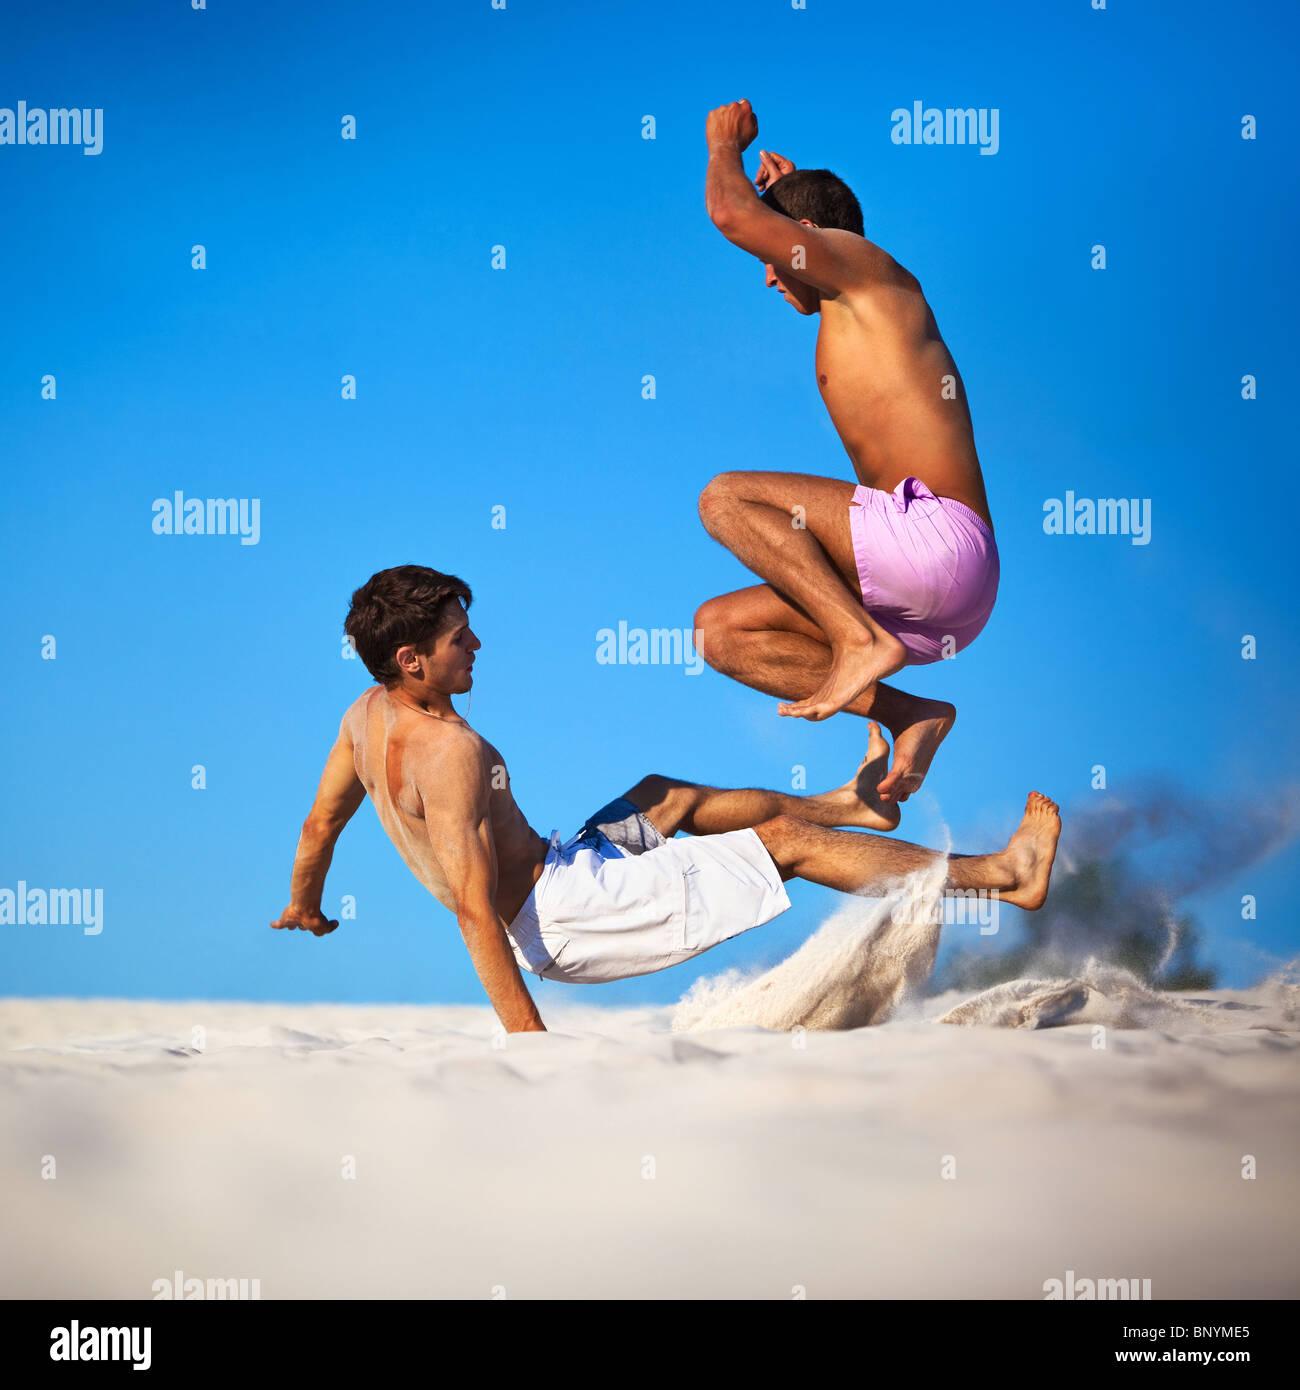 Zwei junge Männer Sport kämpfen am Strand. Stockbild